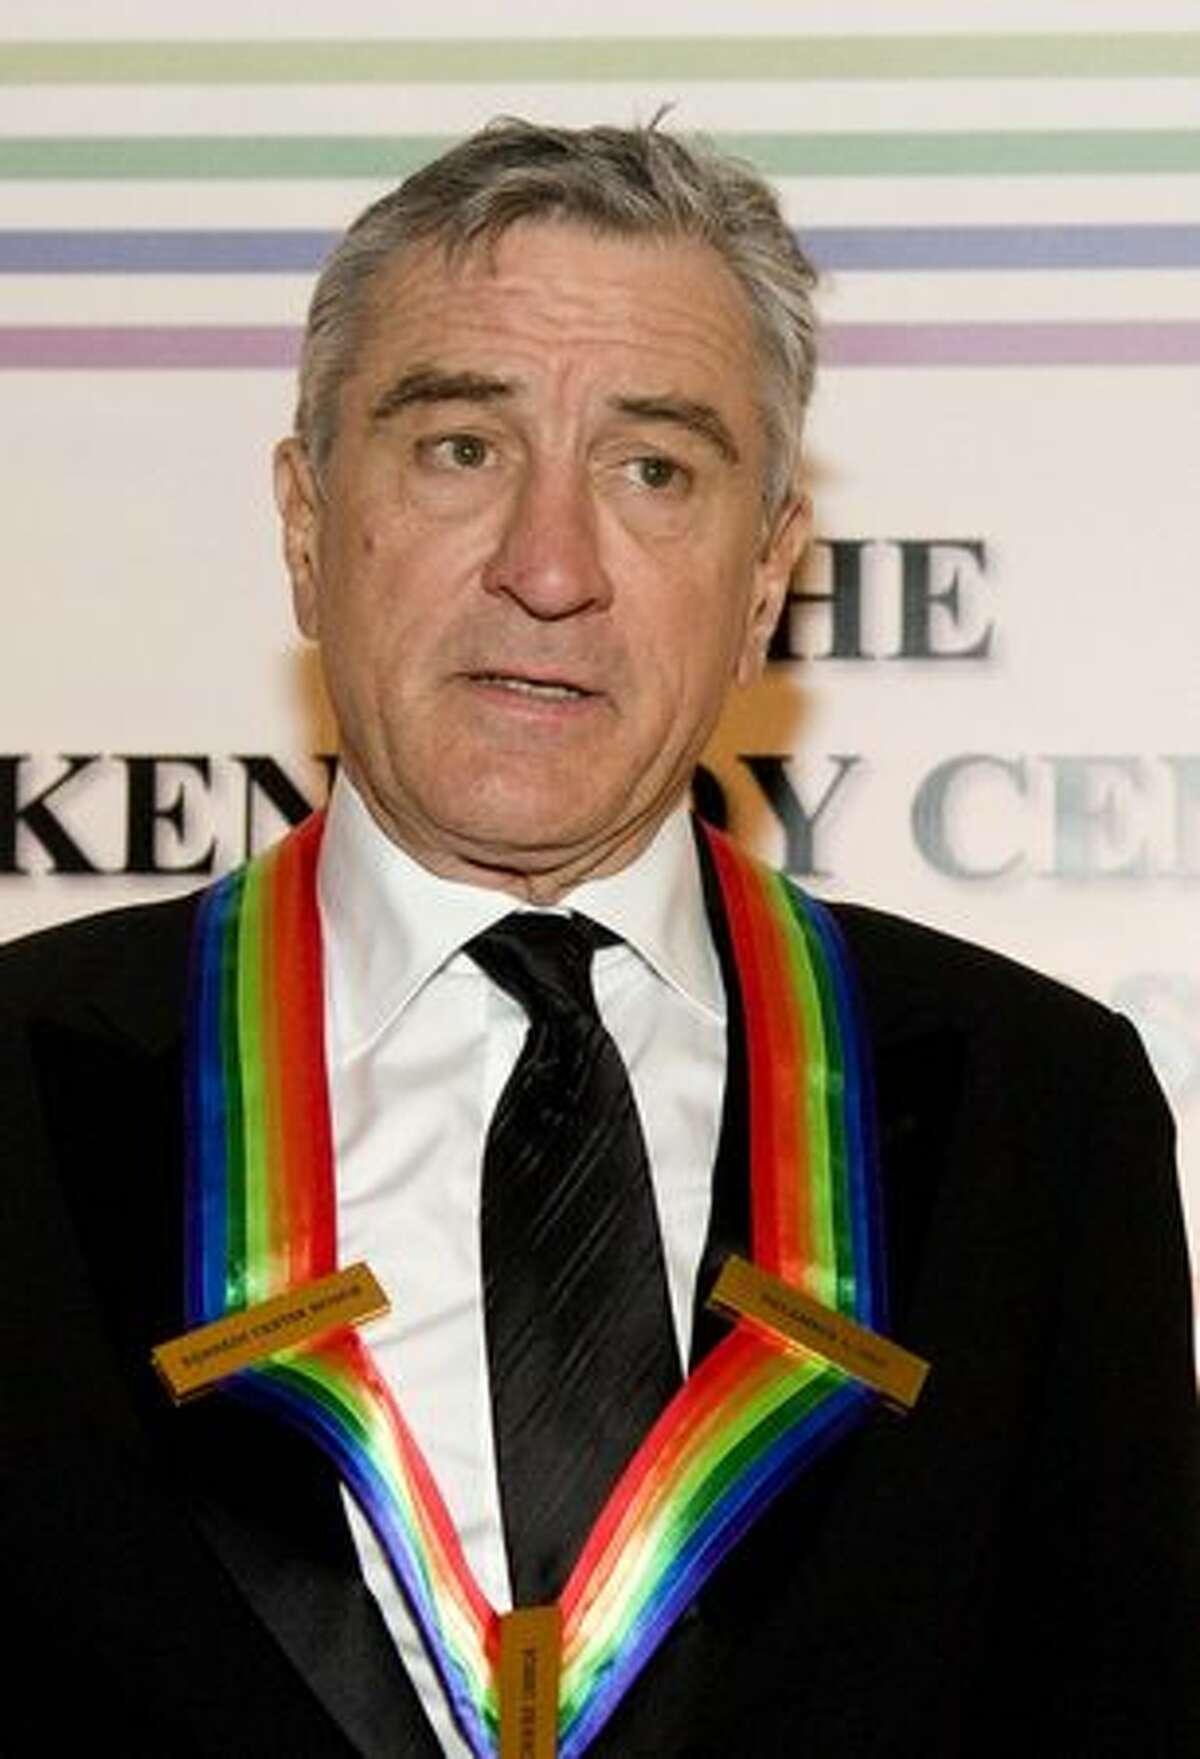 Robert De Niro poses for photos on the red carpet.